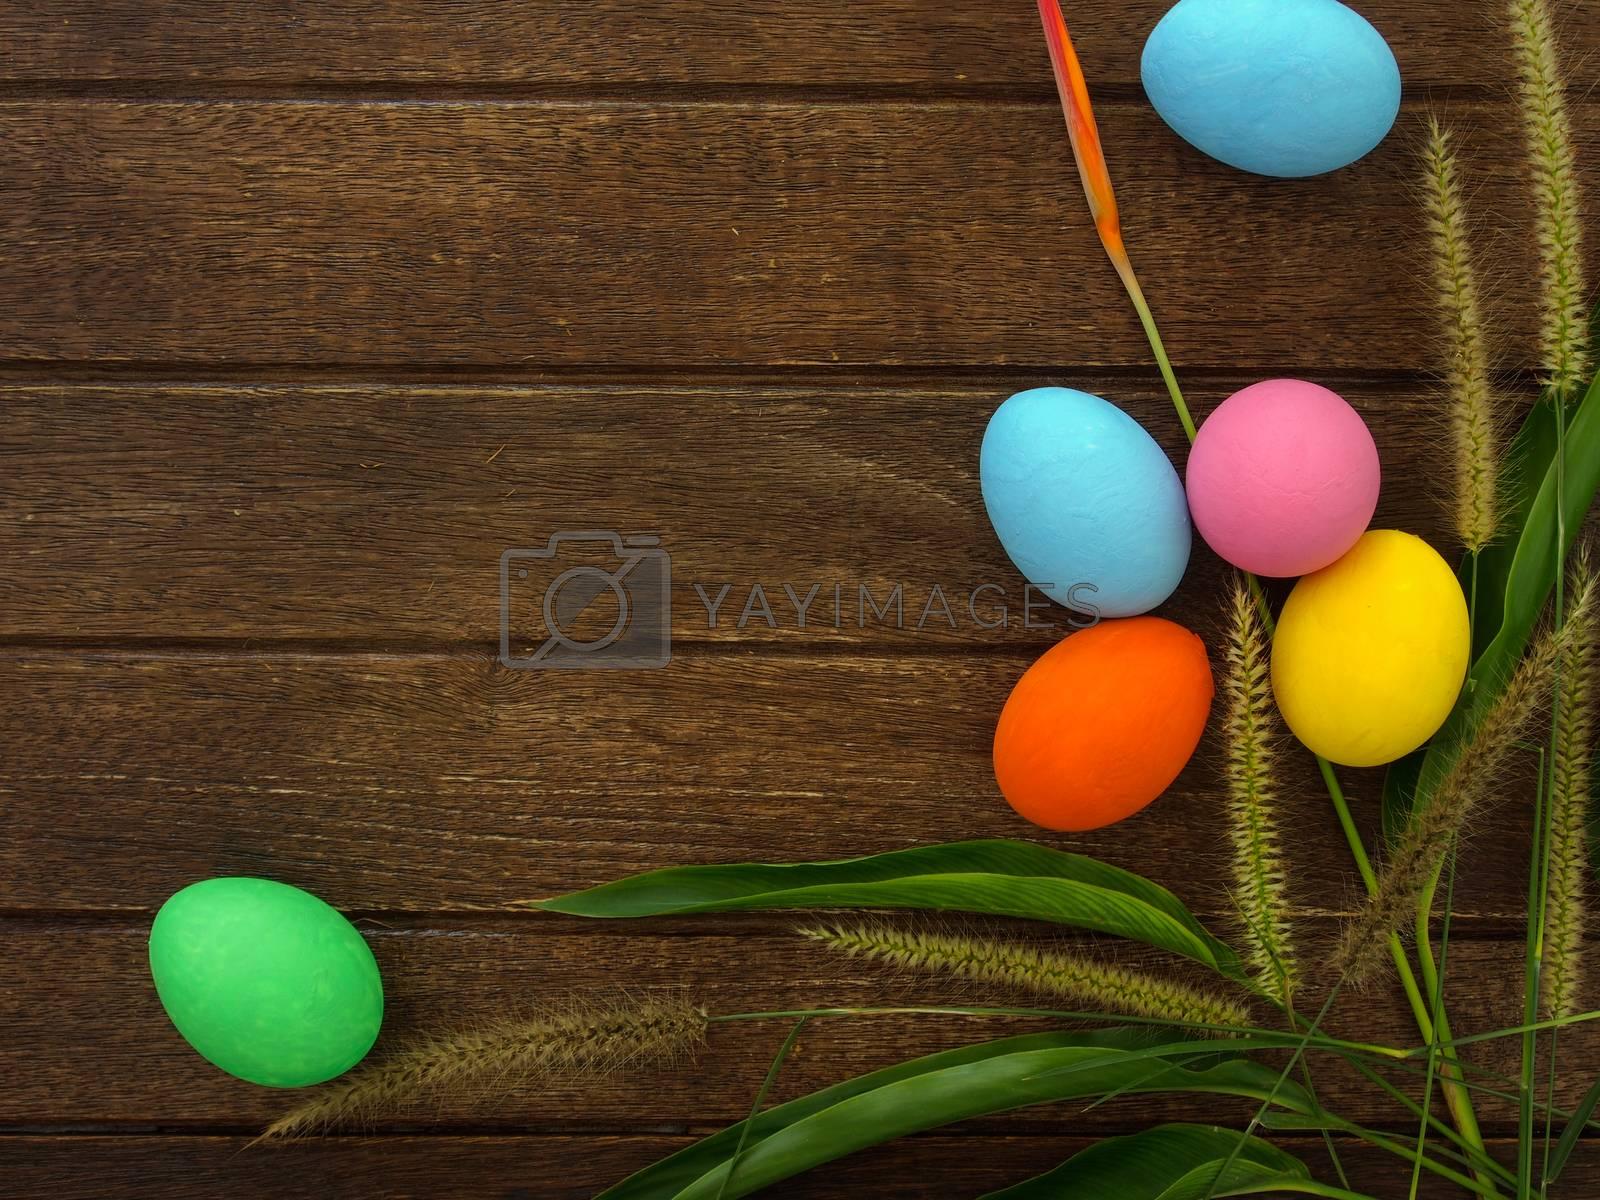 easter egg by Phonlawat